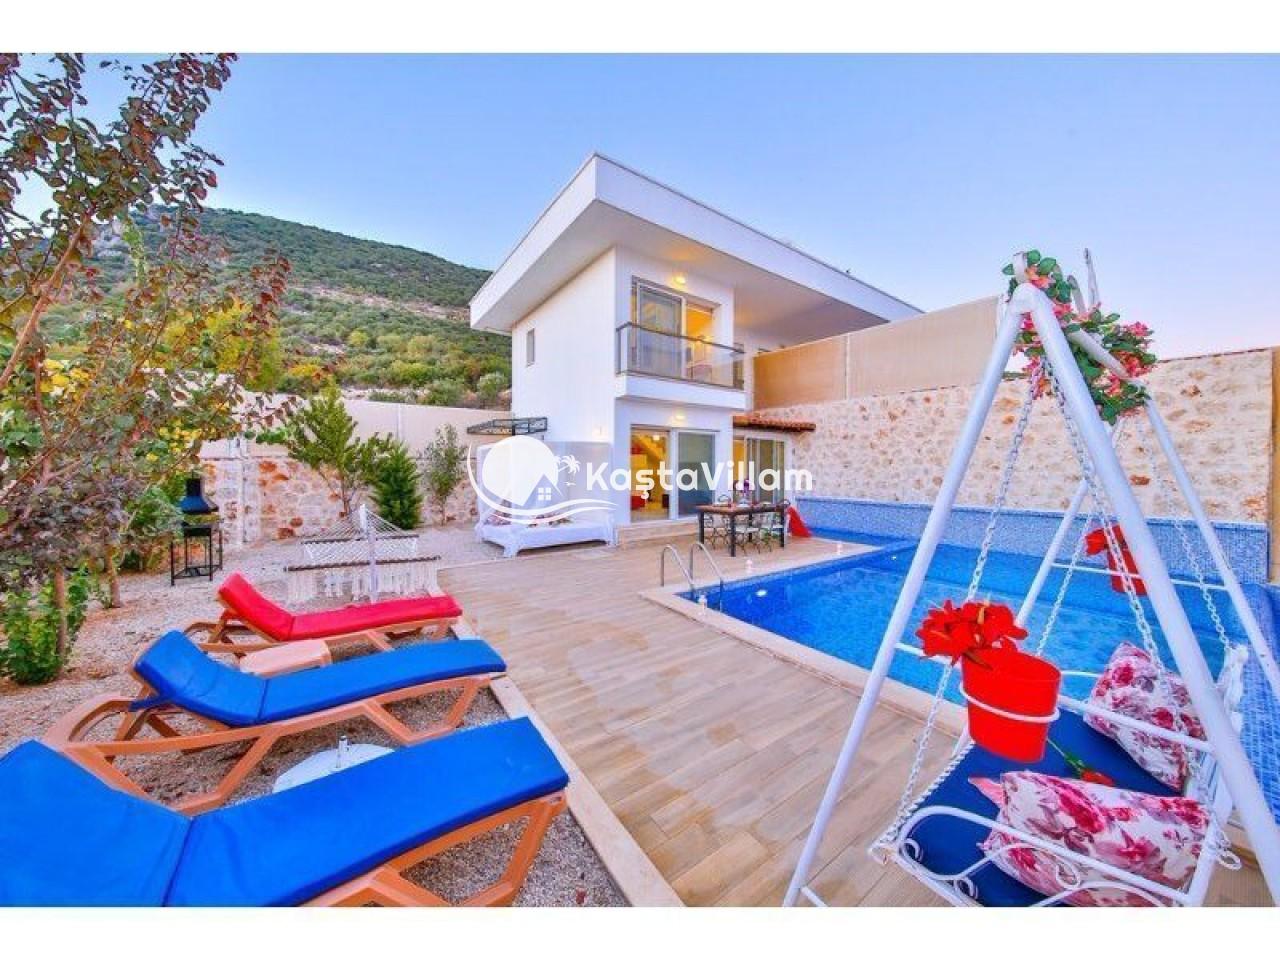 VİLLA ÖNAY 1 | Kaş Kiralık Villa, Kaş Yazlık Villa - Kaştavillam